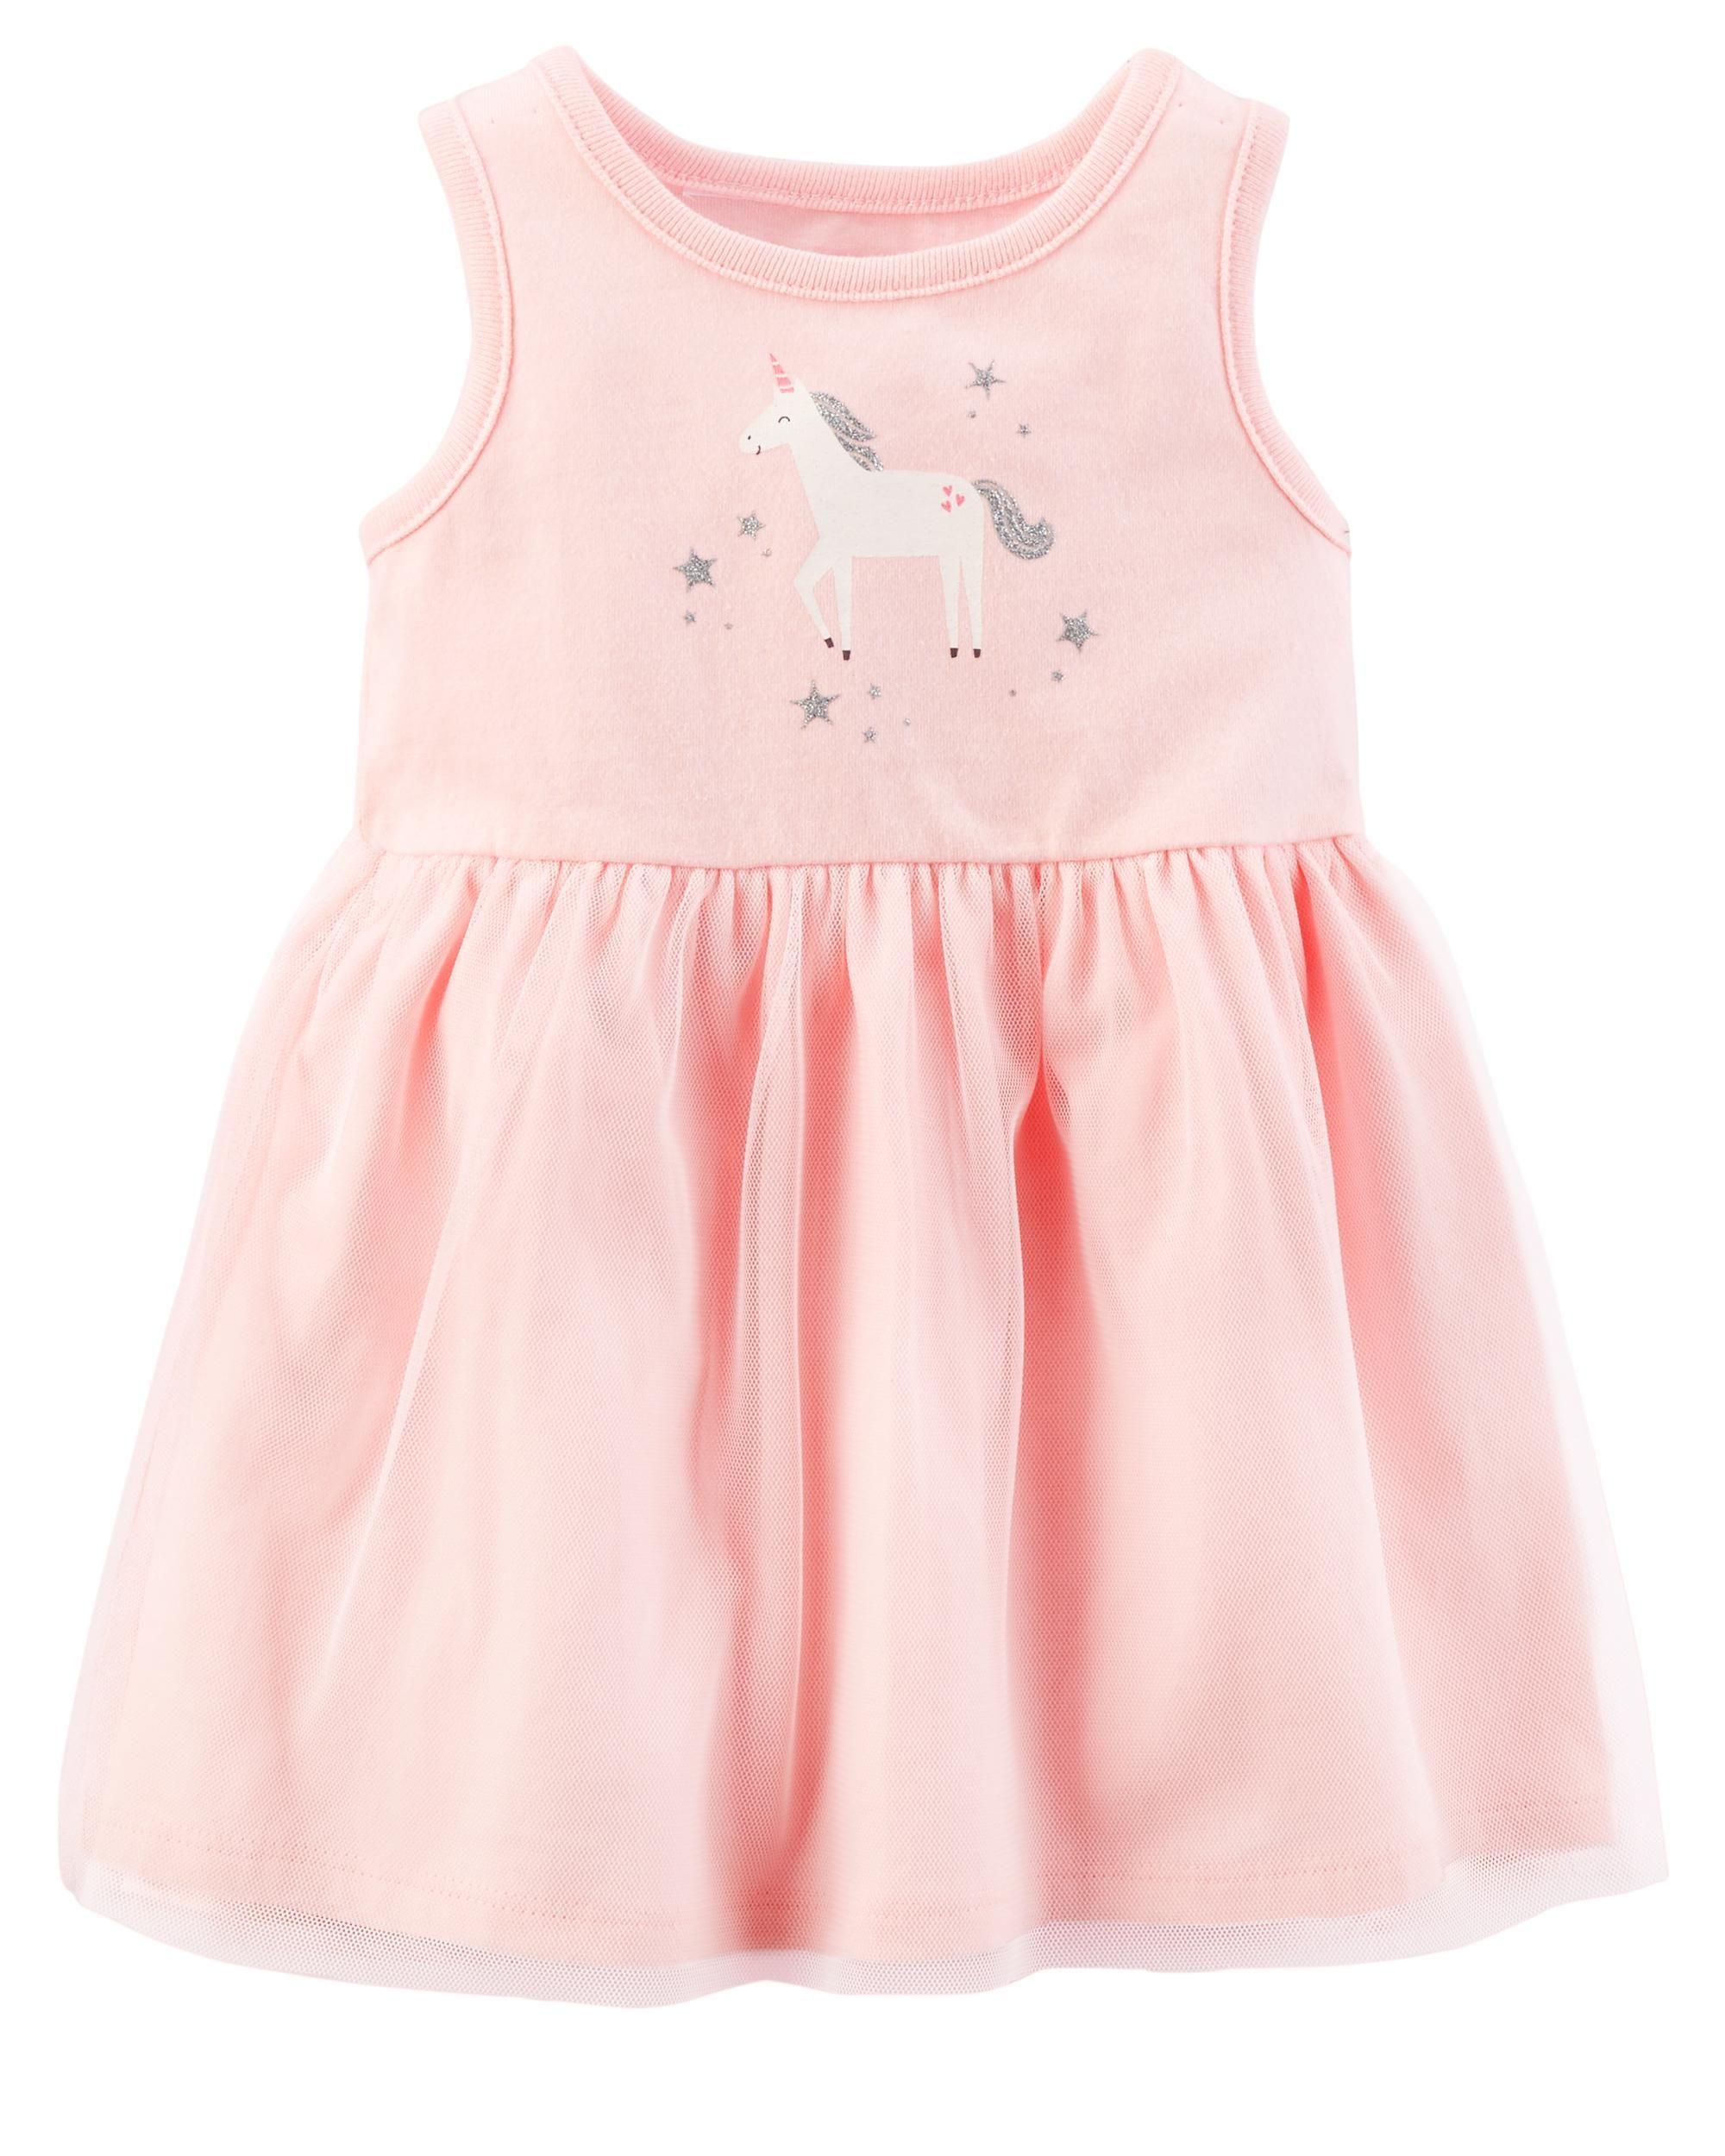 5bcbf104e1461 Unicorn Jersey Dress | Baby checklist | Tulle skirt dress, Baby ...